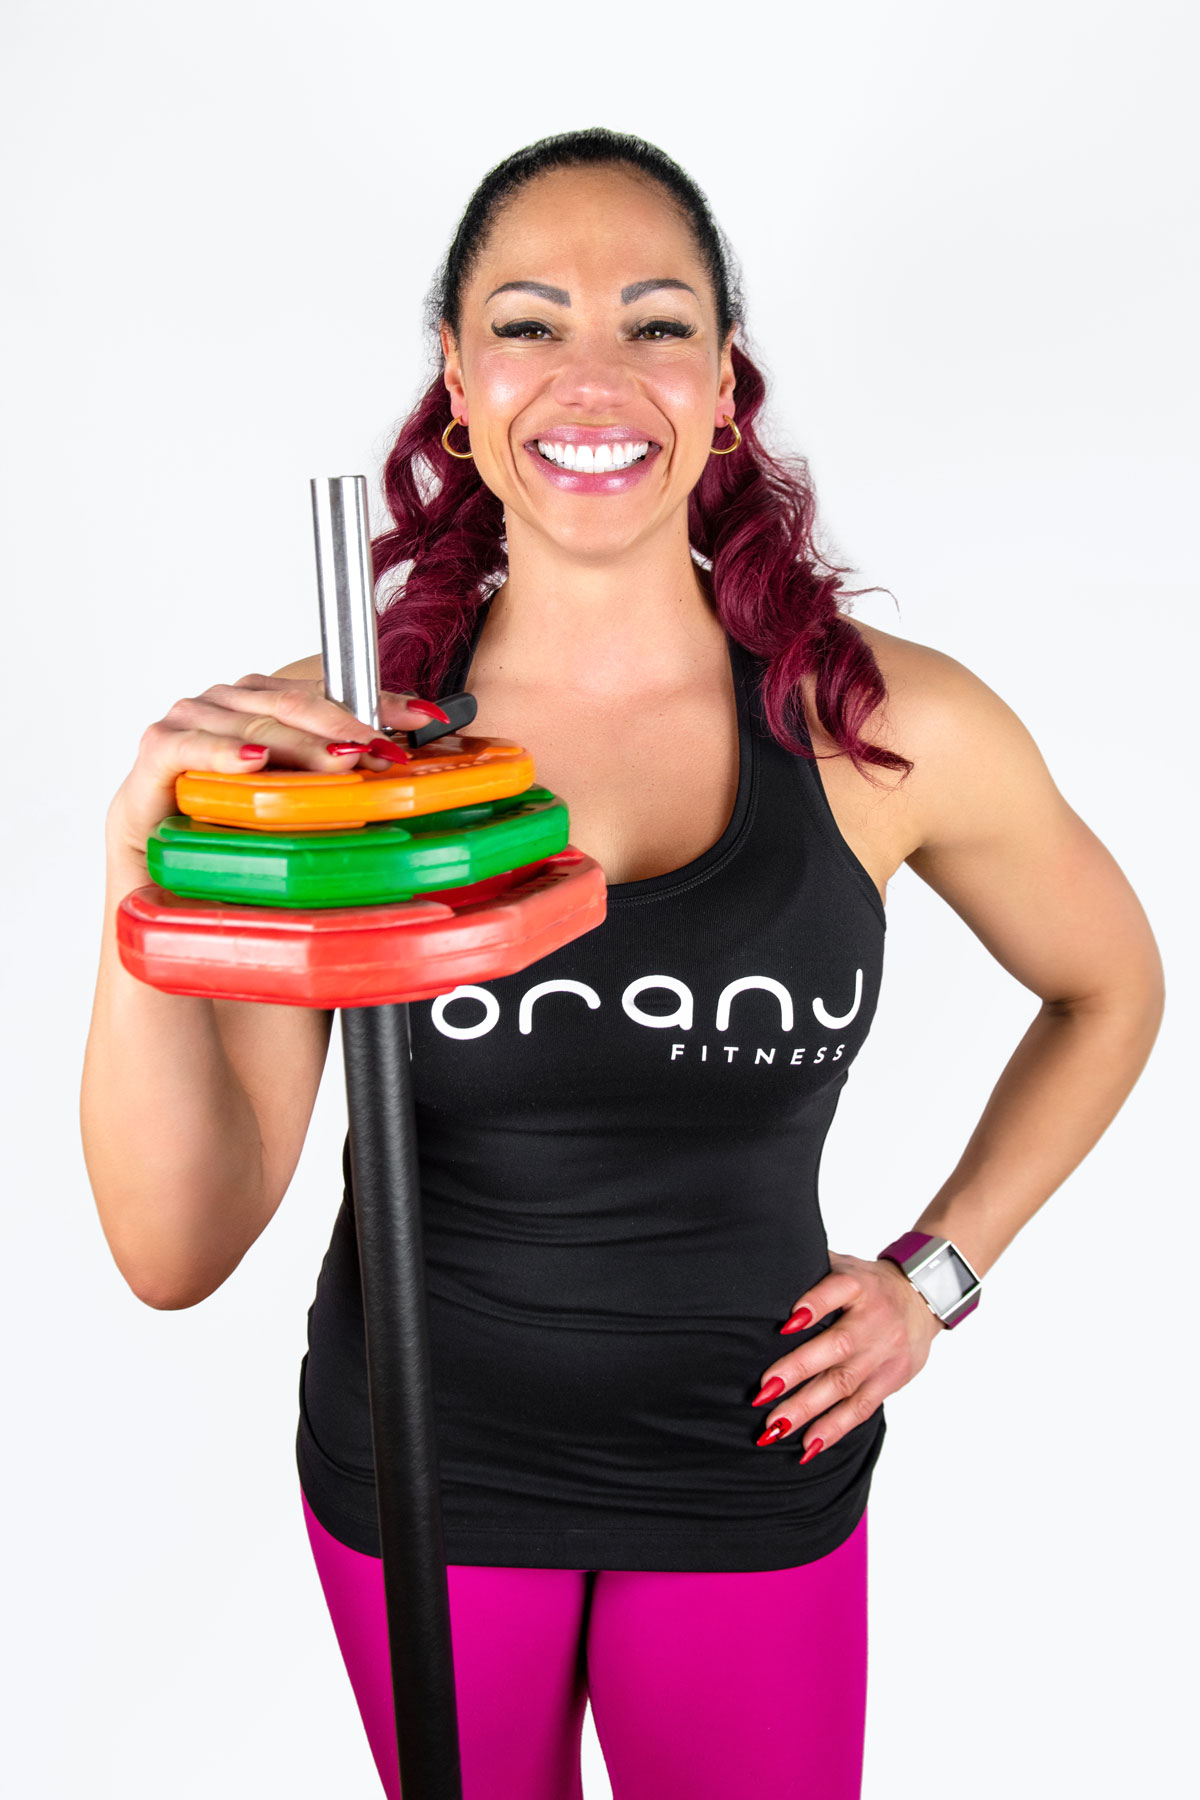 Naticia MacDougall from Oranj Fitness